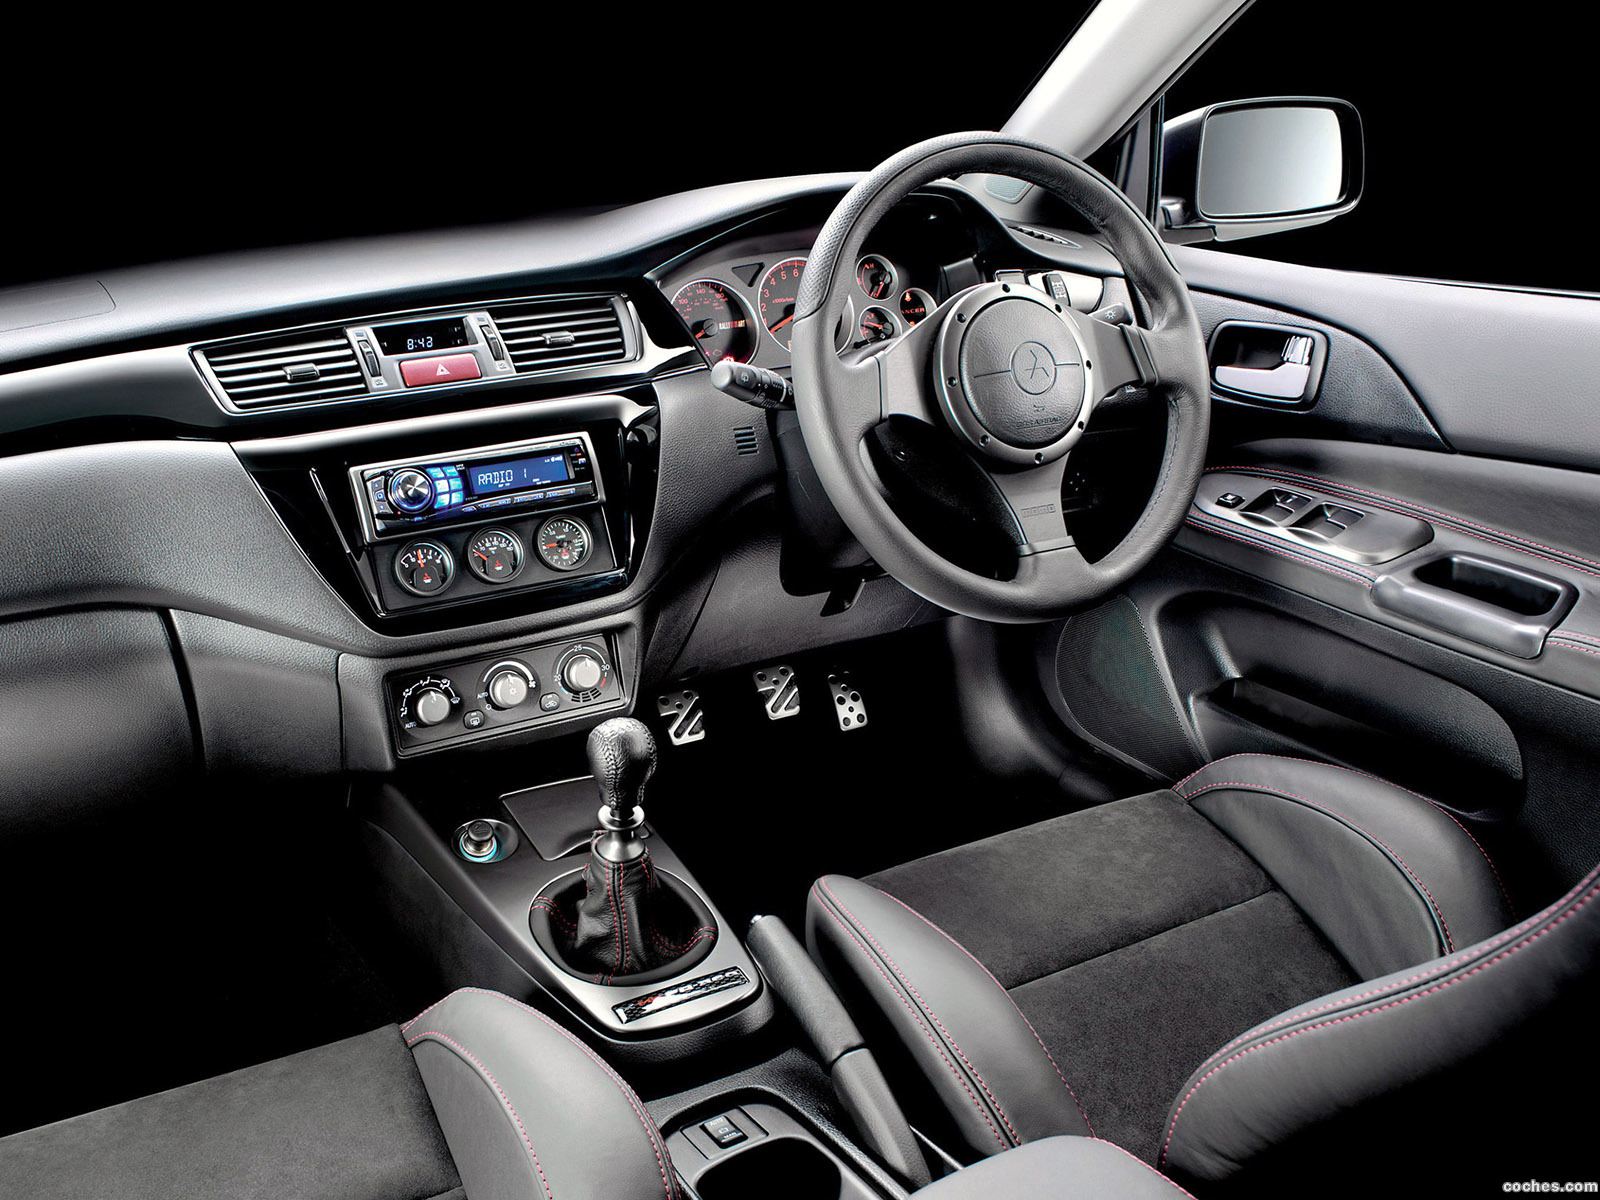 Foto 14 de Mitsubishi Lancer Evolution IX MR FQ 360 Final Edition 2007